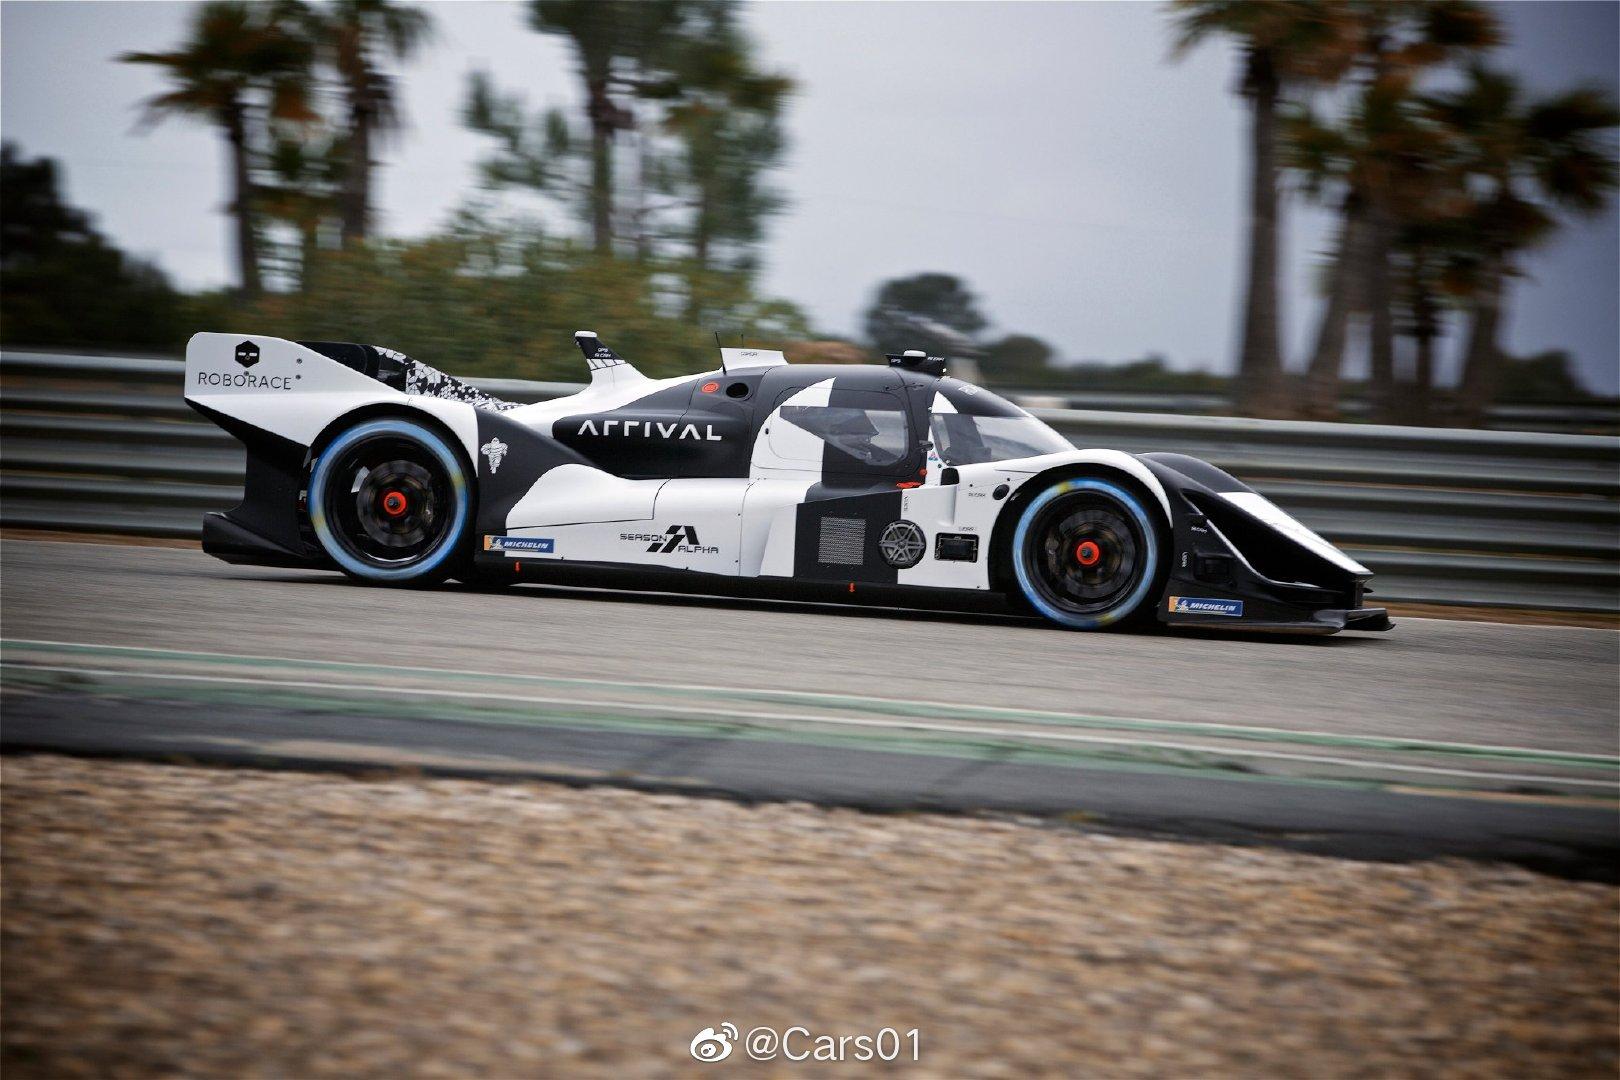 Roborace宣布将在2019古德伍德速度节上推出DevBot 2.0自动驾驶赛车